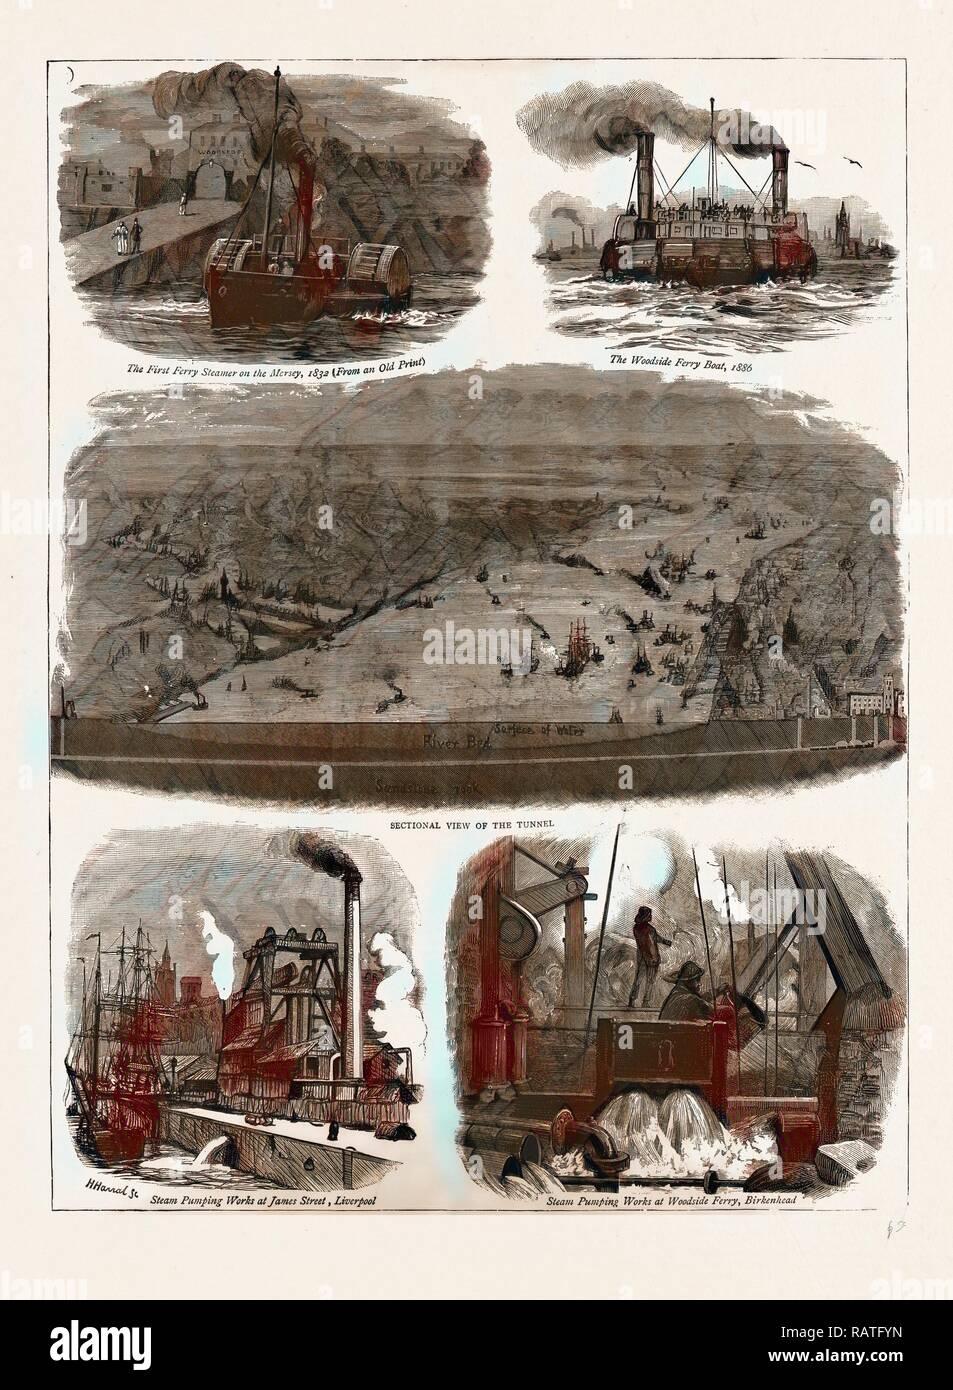 LIVERPOOL.Seacombe,Egremont,Woodside Ferry,River Mersey,Birkenhead 1935 map